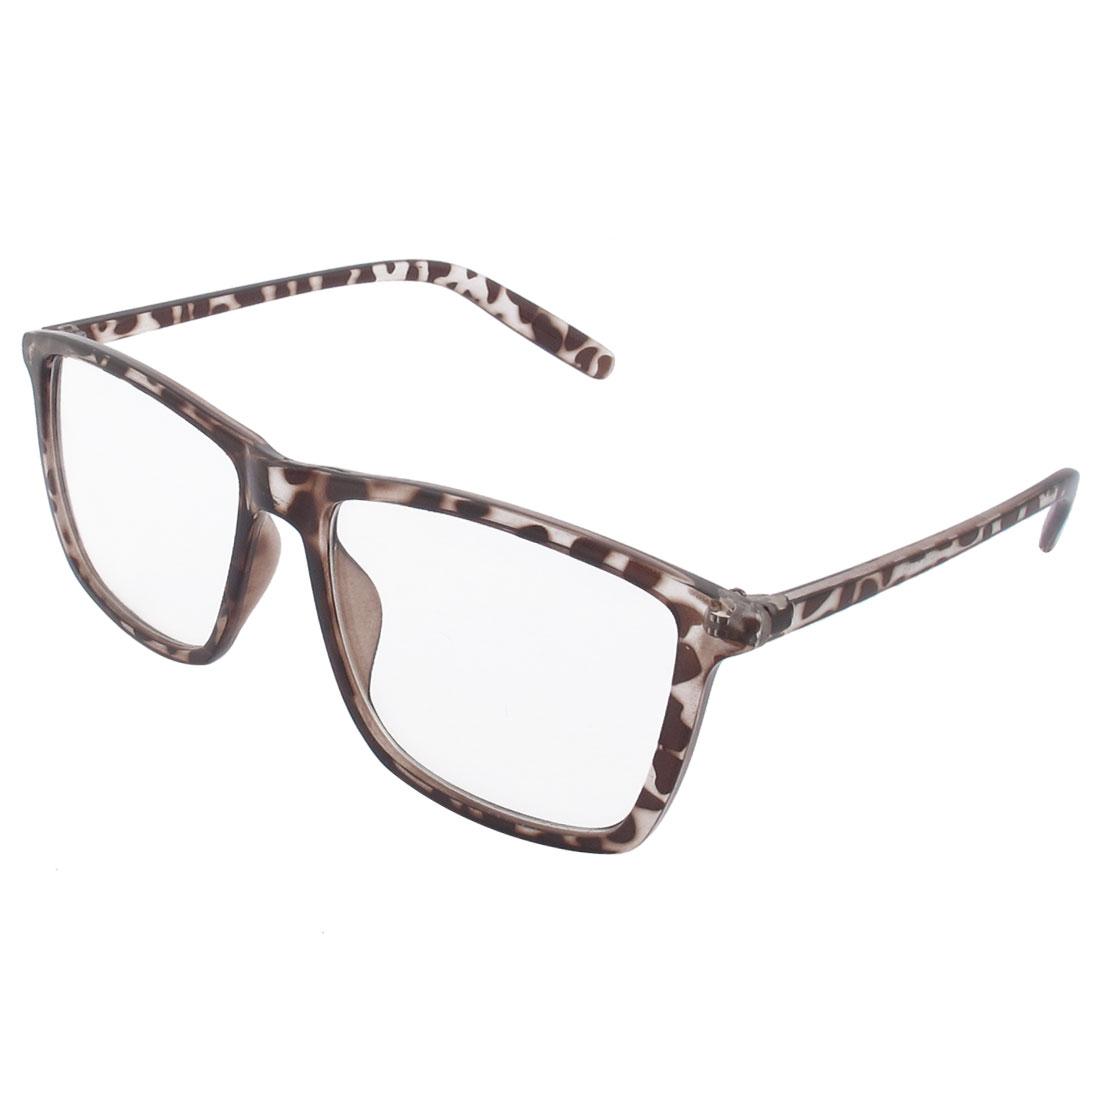 Brown Plastic Leopard Pattern Frame Full Rims Clear Lens Glasses Spectacles